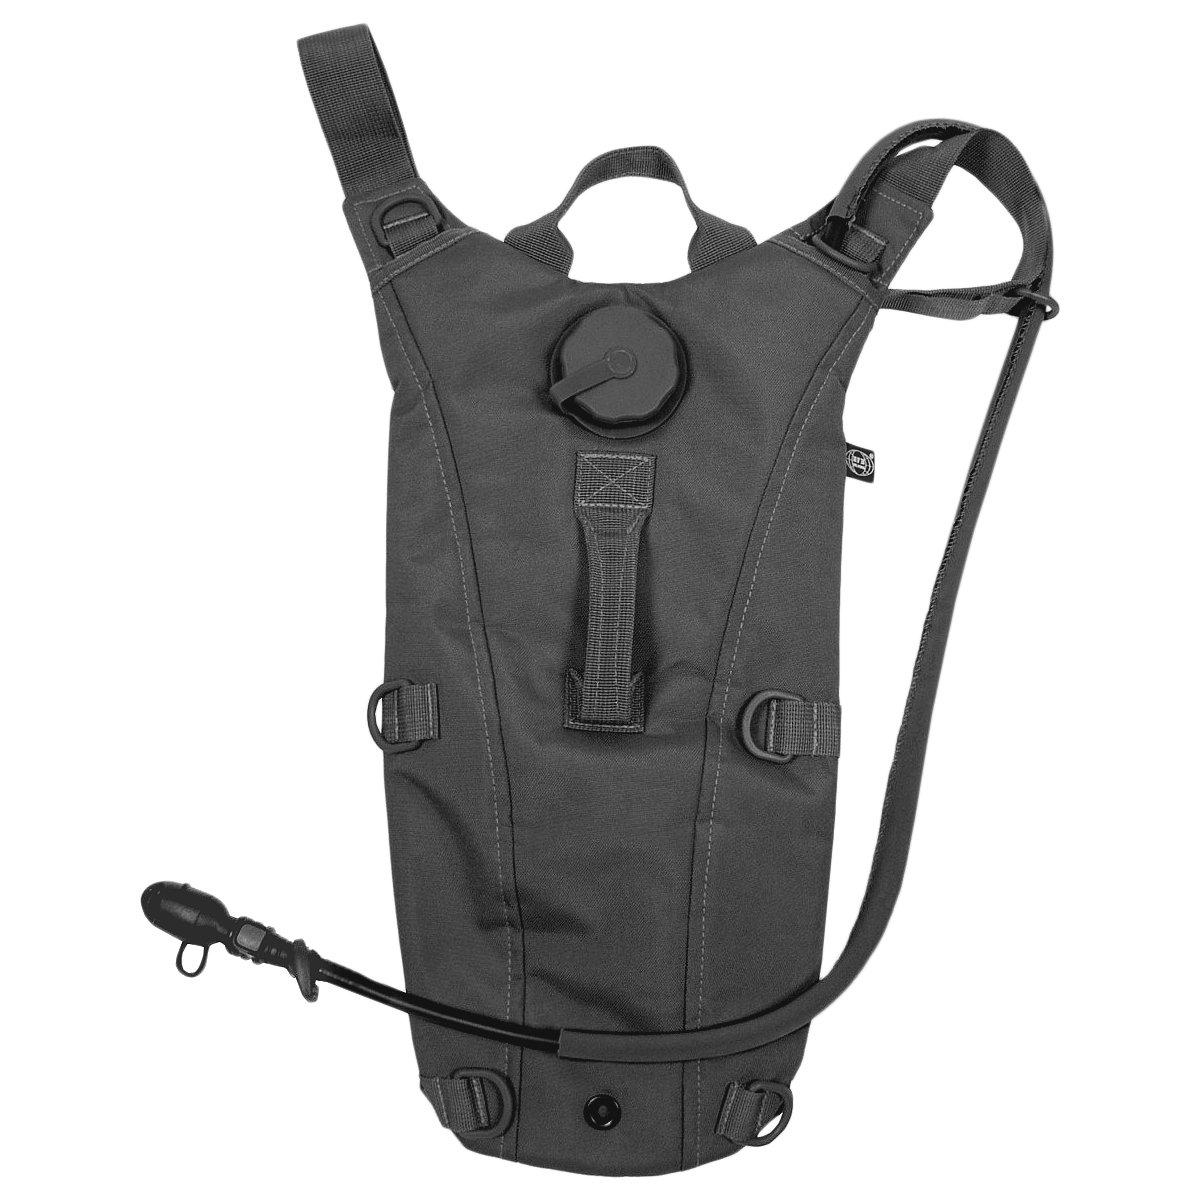 MFH Hydration Backpack TPU Extreme Black by MFH Max Fuchs